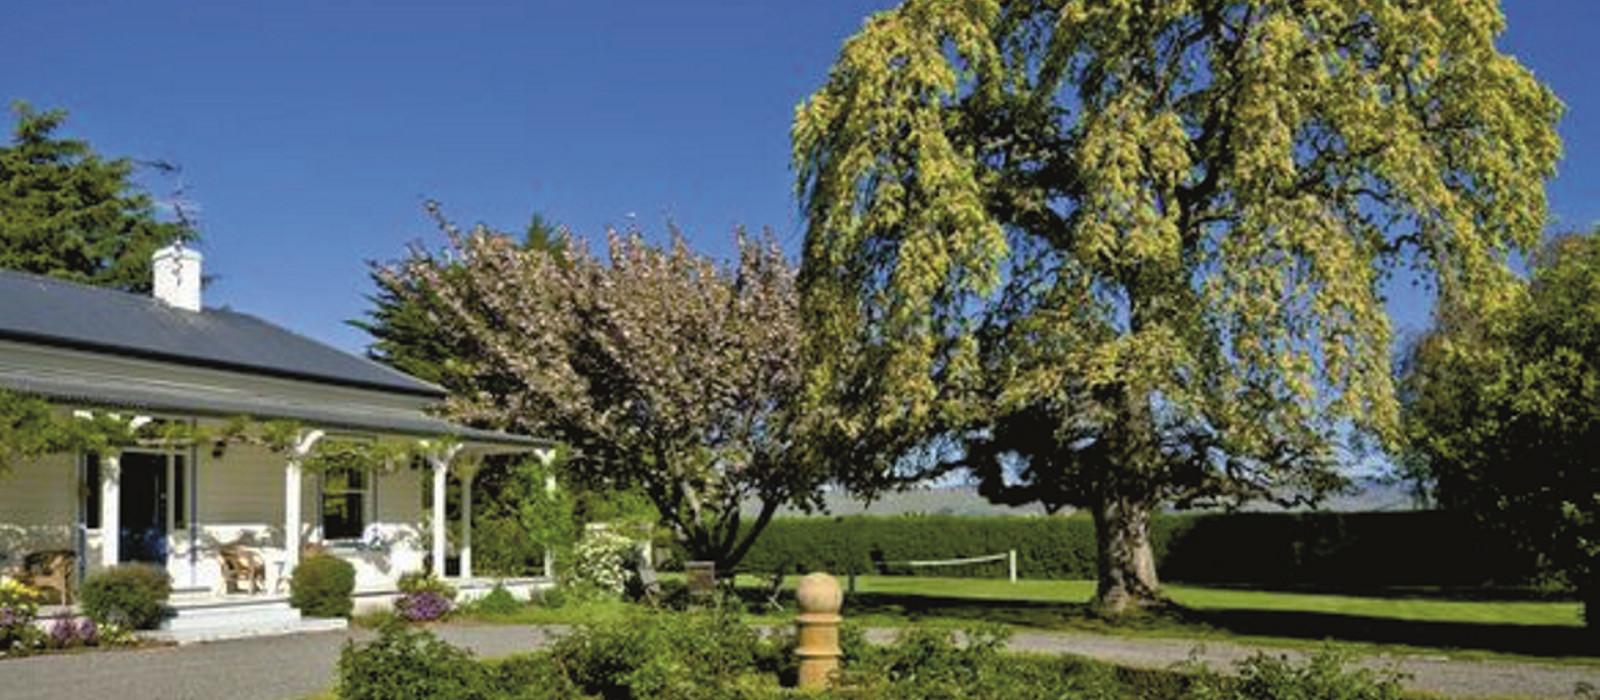 Hotel St Leonards Vineyard Cottages New Zealand